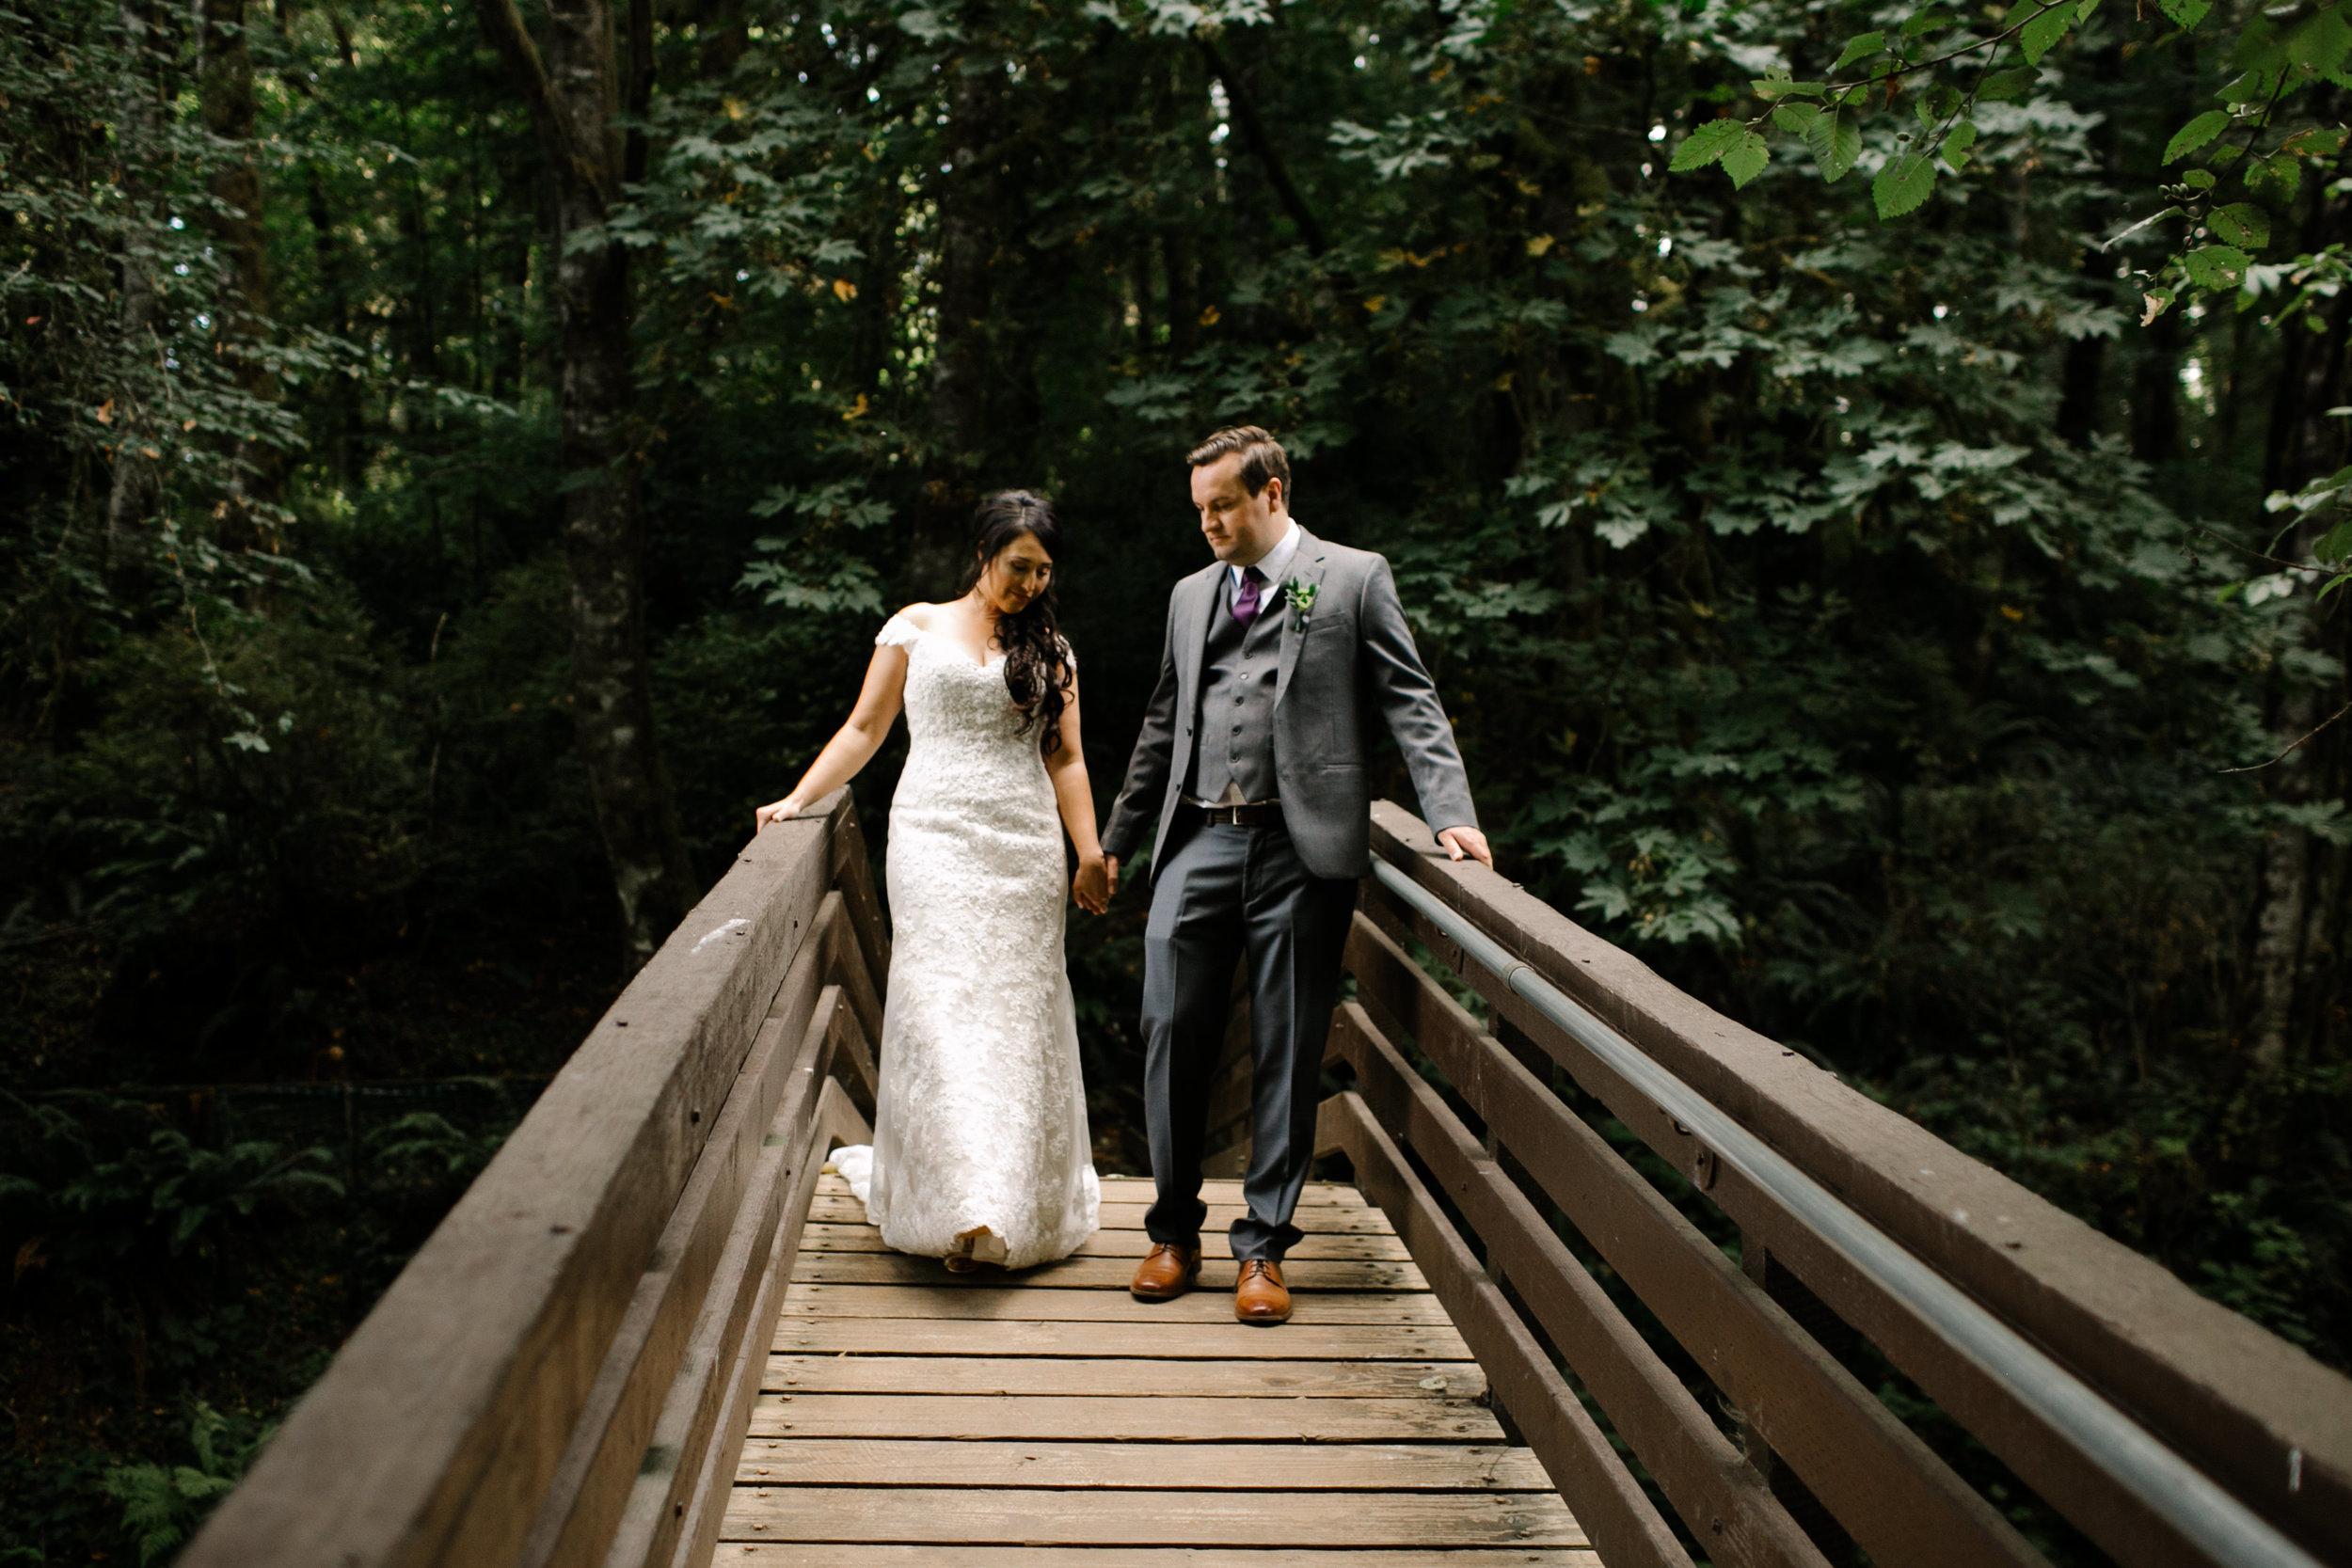 Sevlynn-Photography-Teresa-Chandler-Wedding-21.jpg